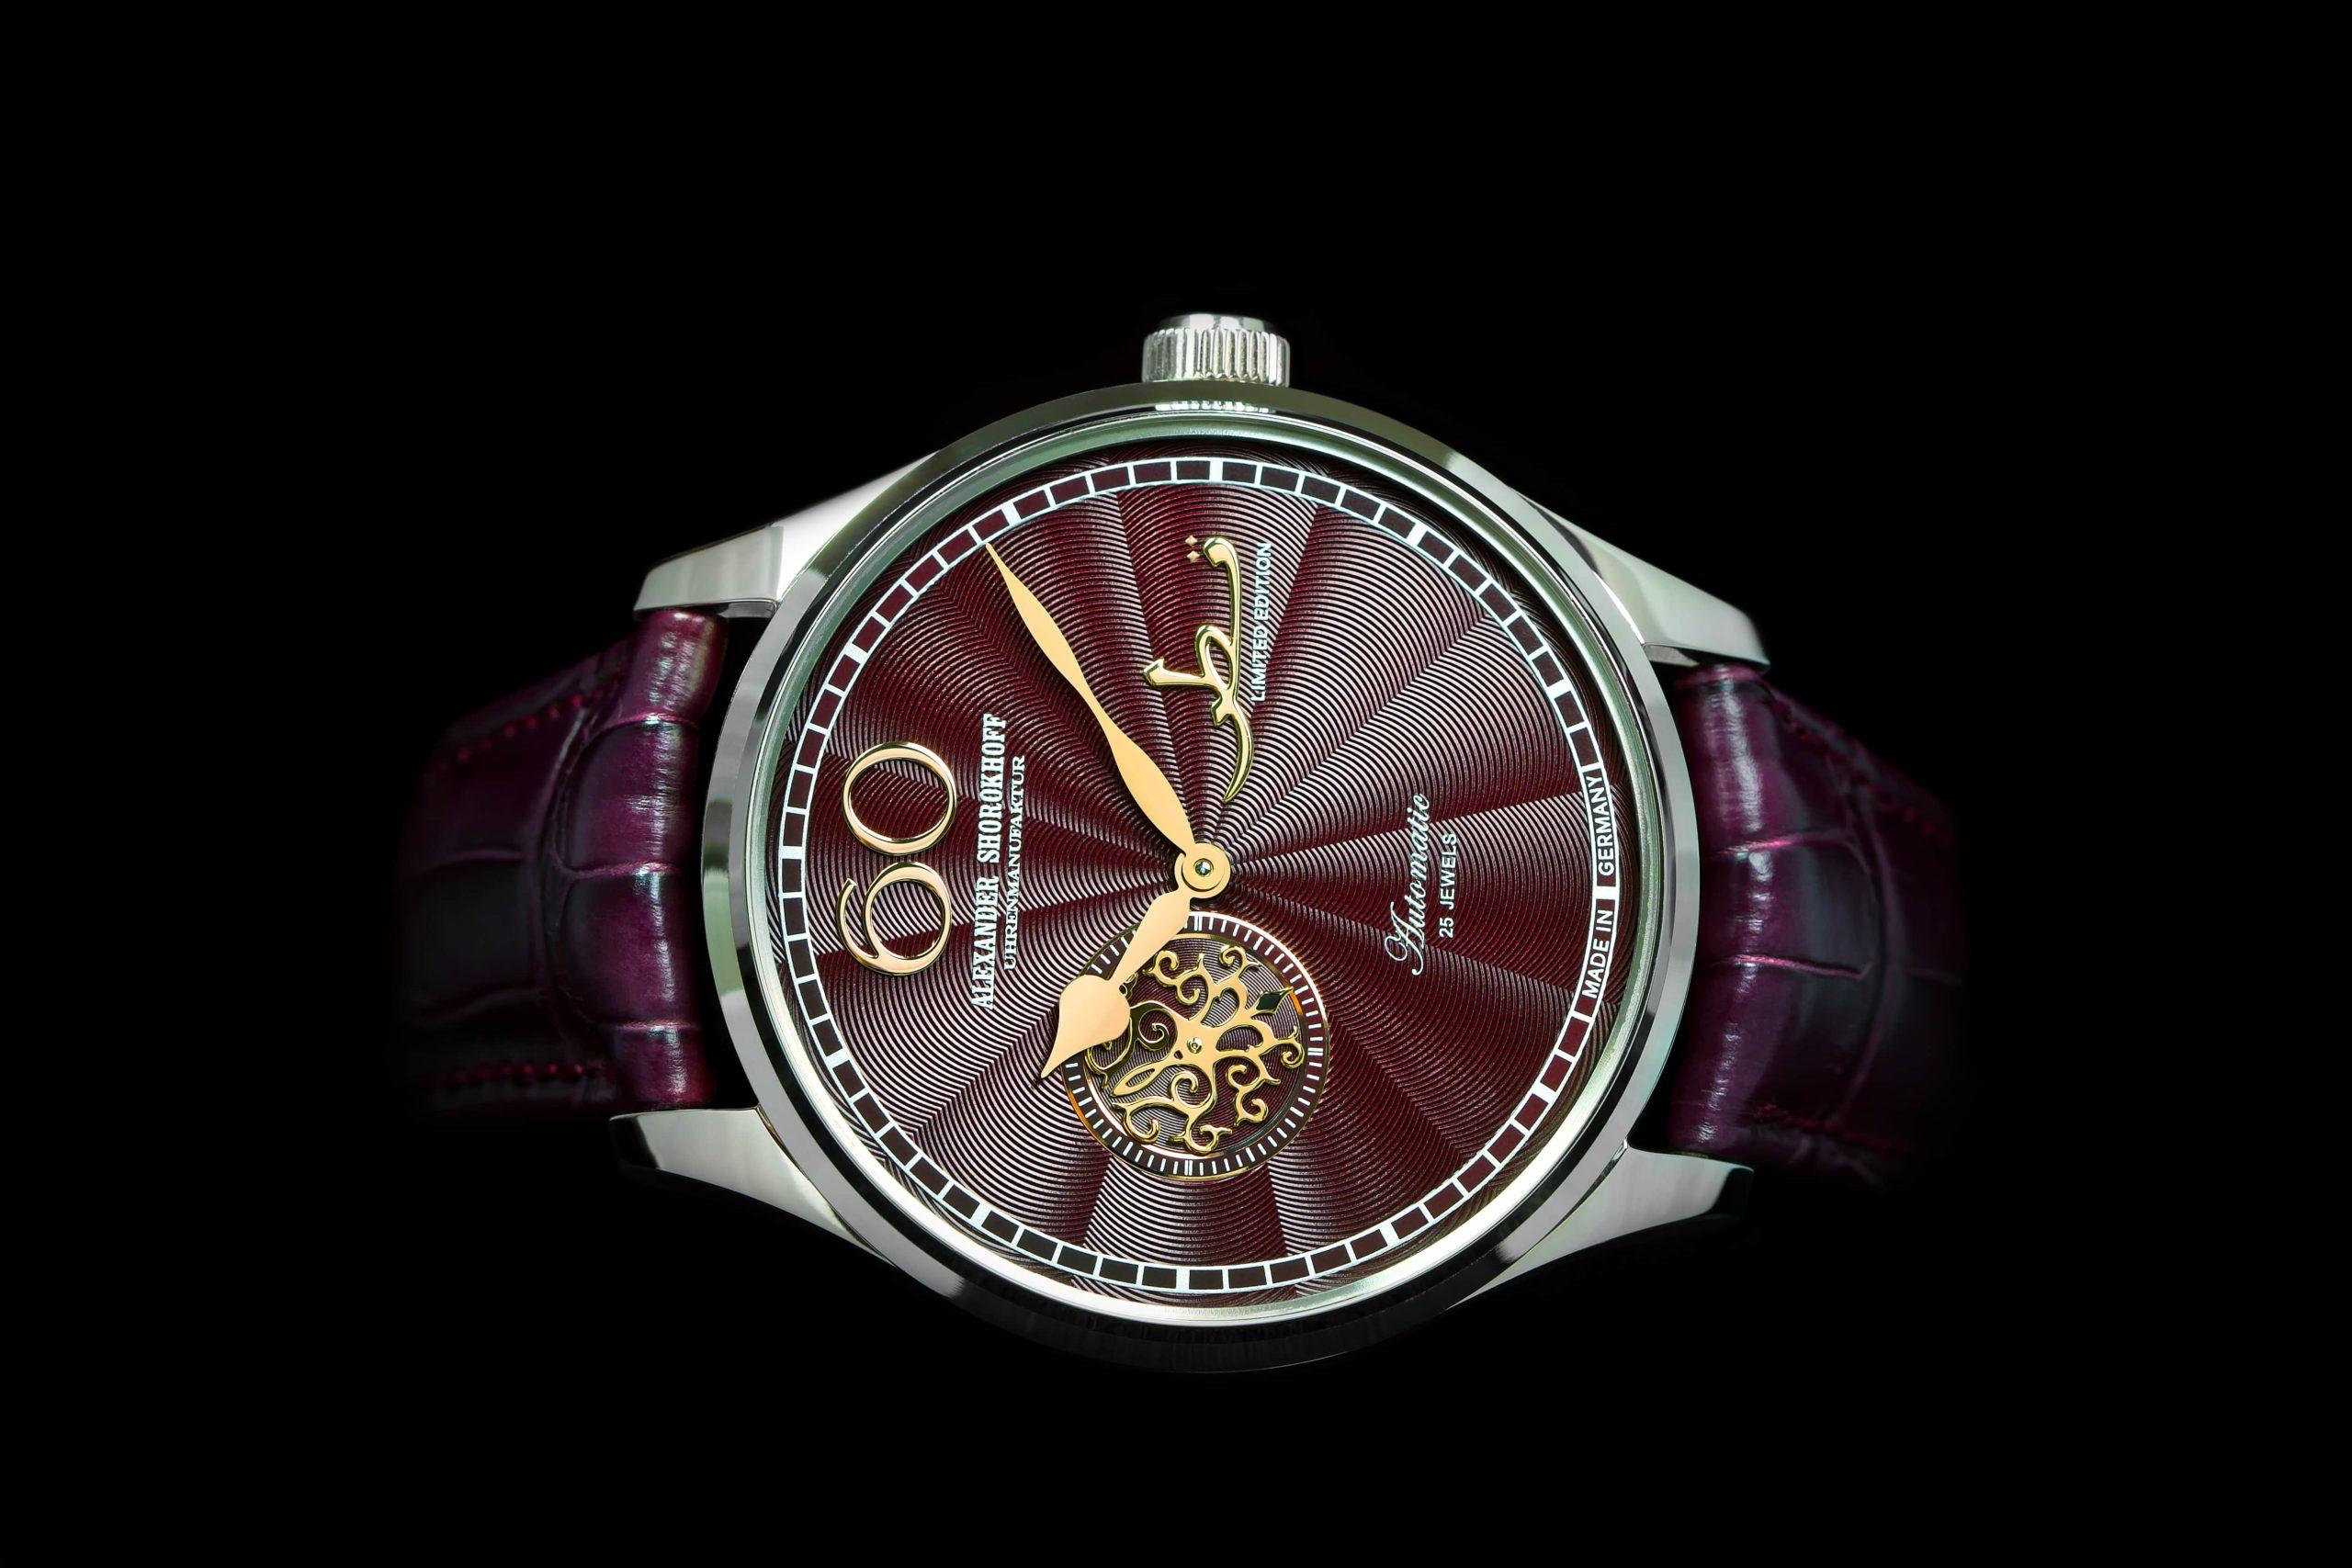 private label alexander shorokhoff watch